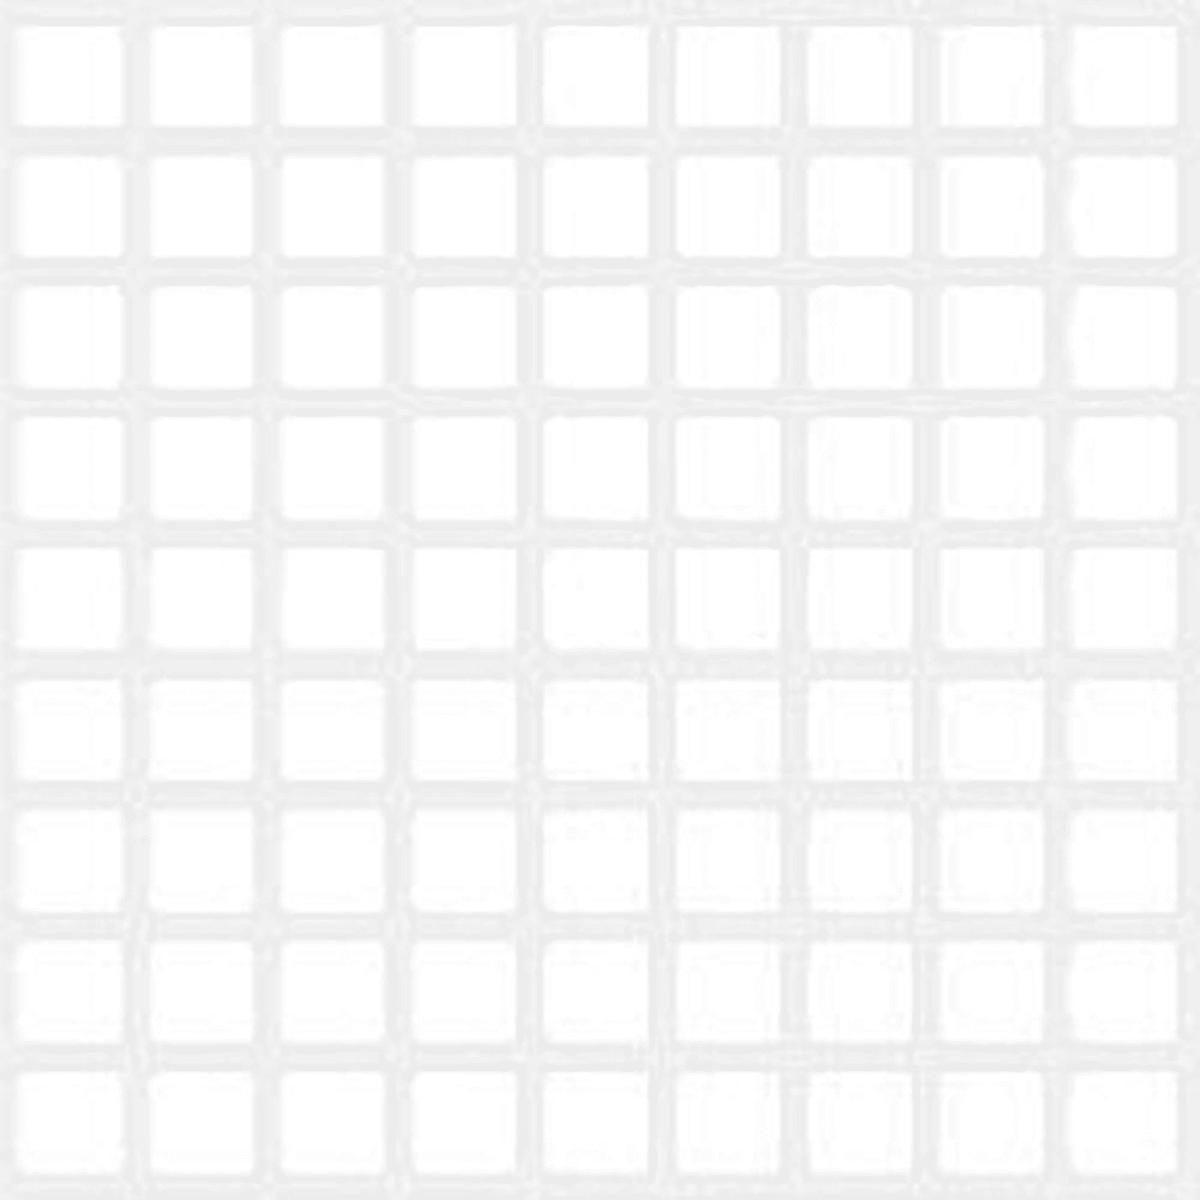 Панель ПВХ листовая 3 мм 960х485 мм Мозаика белая 0.47 м²